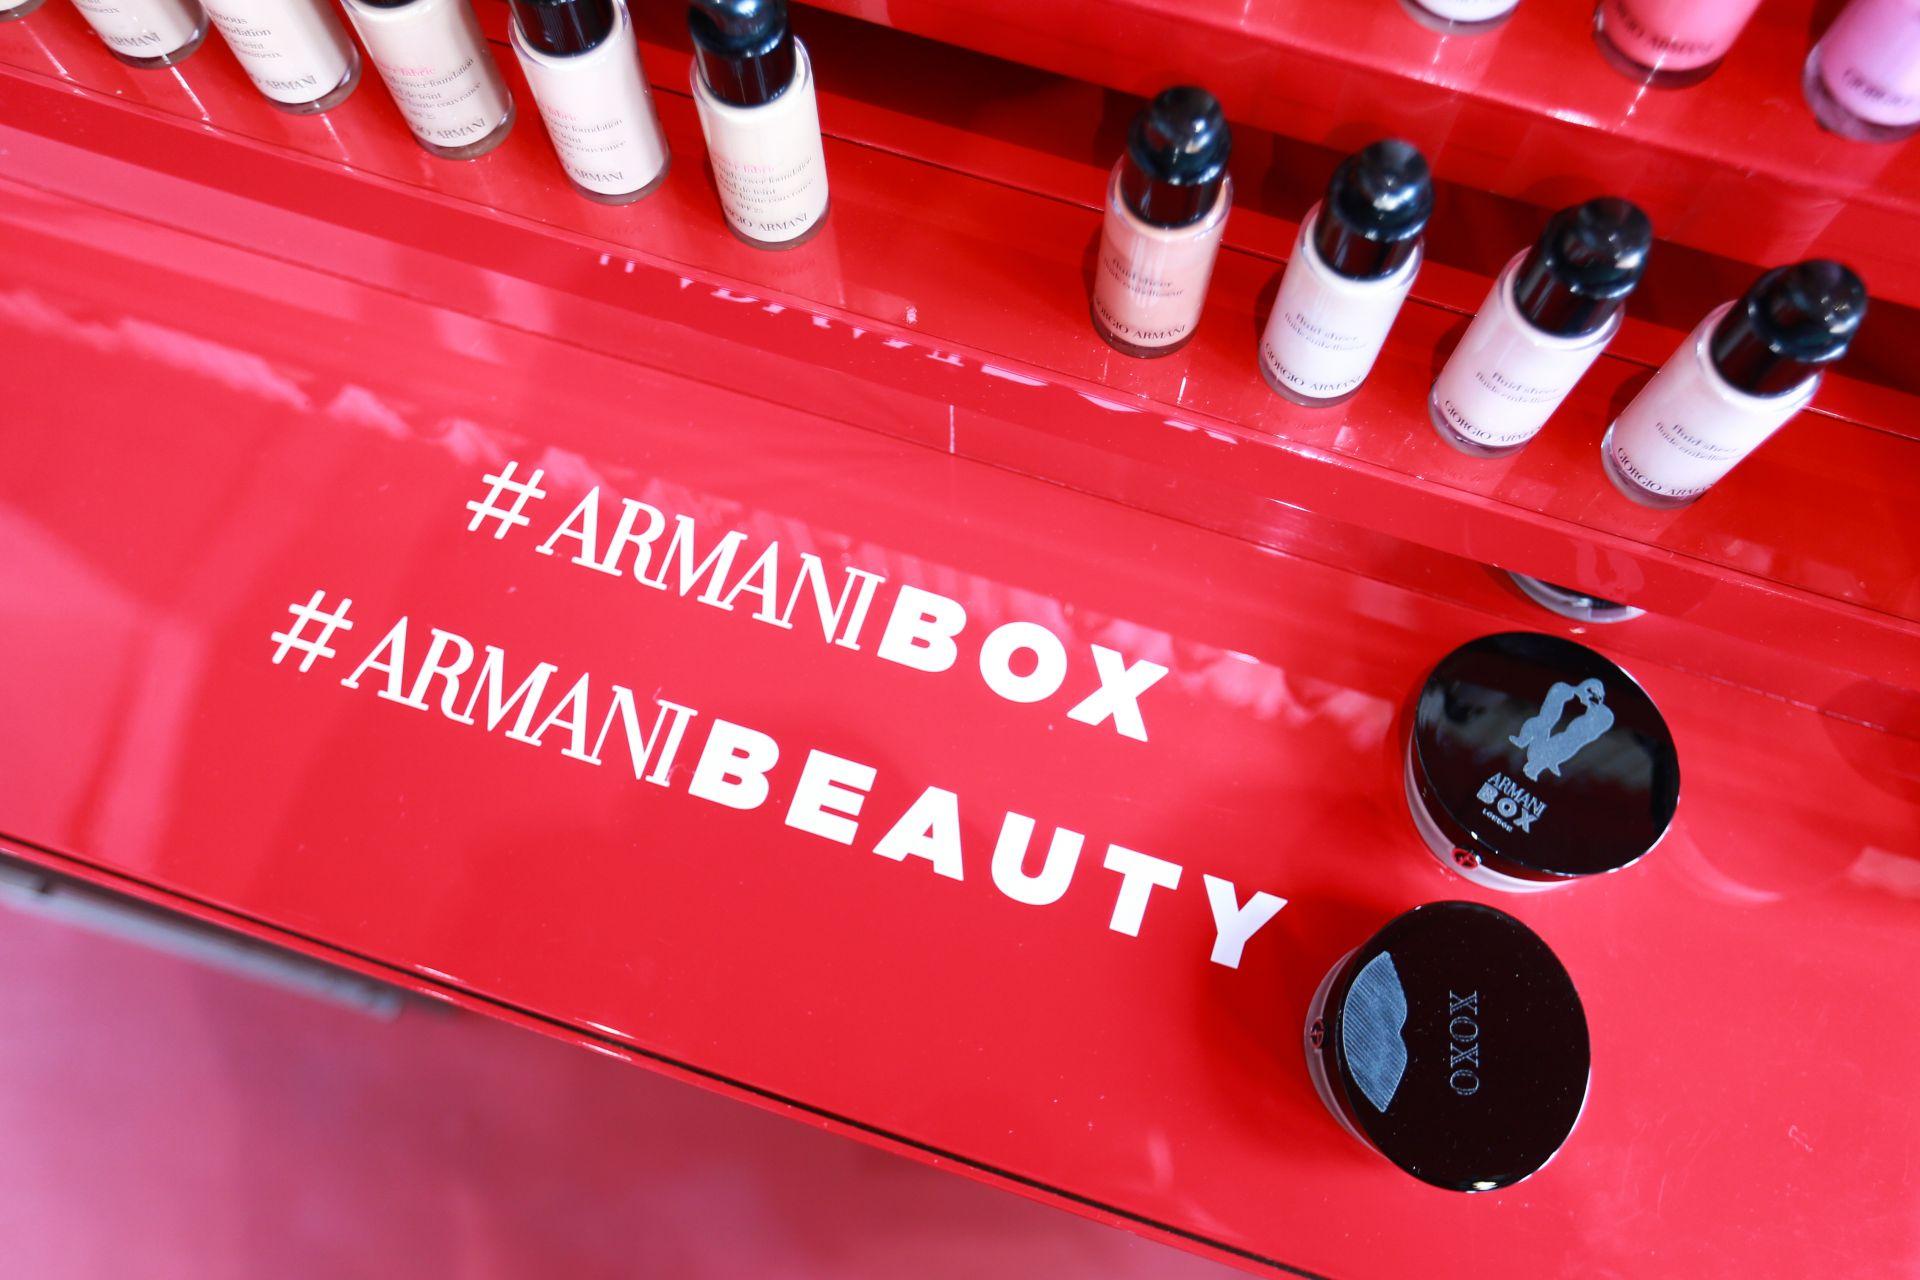 armani box-6